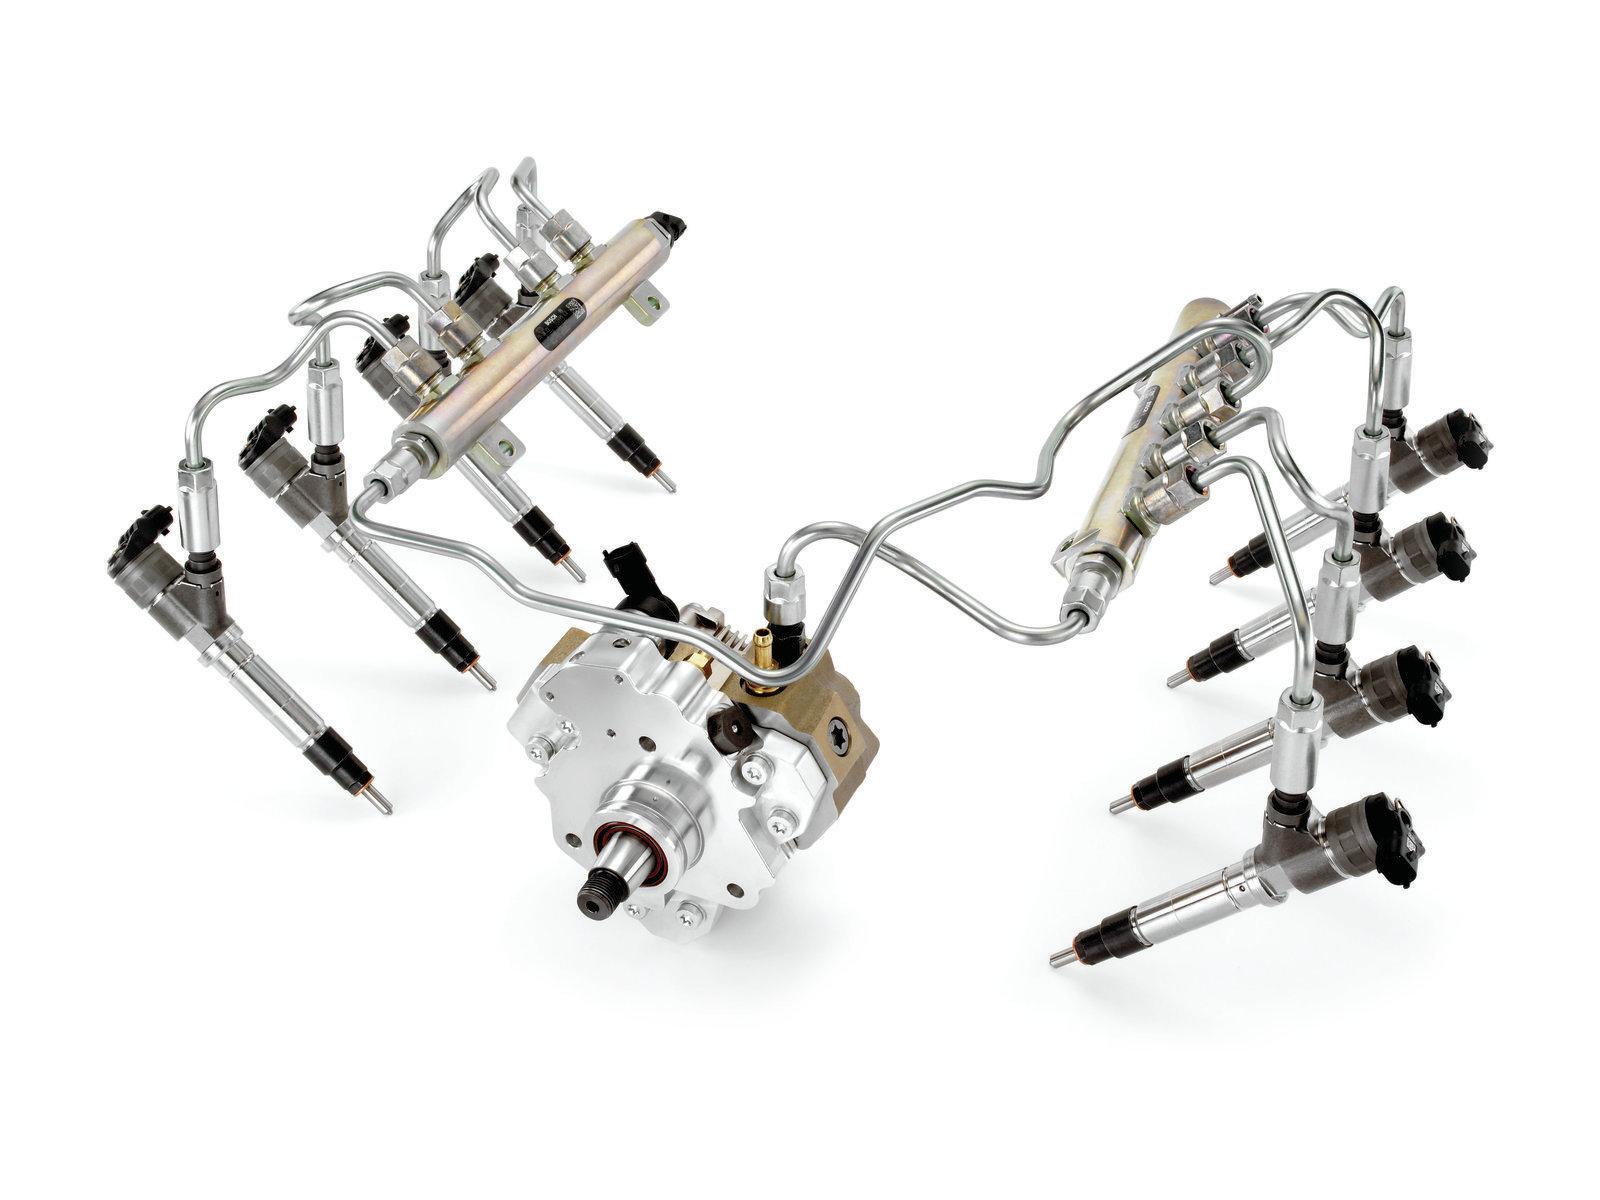 hight resolution of diagram 2000 pontiac montana engine vibration dampener wiring library rh 99 budoshop4you de